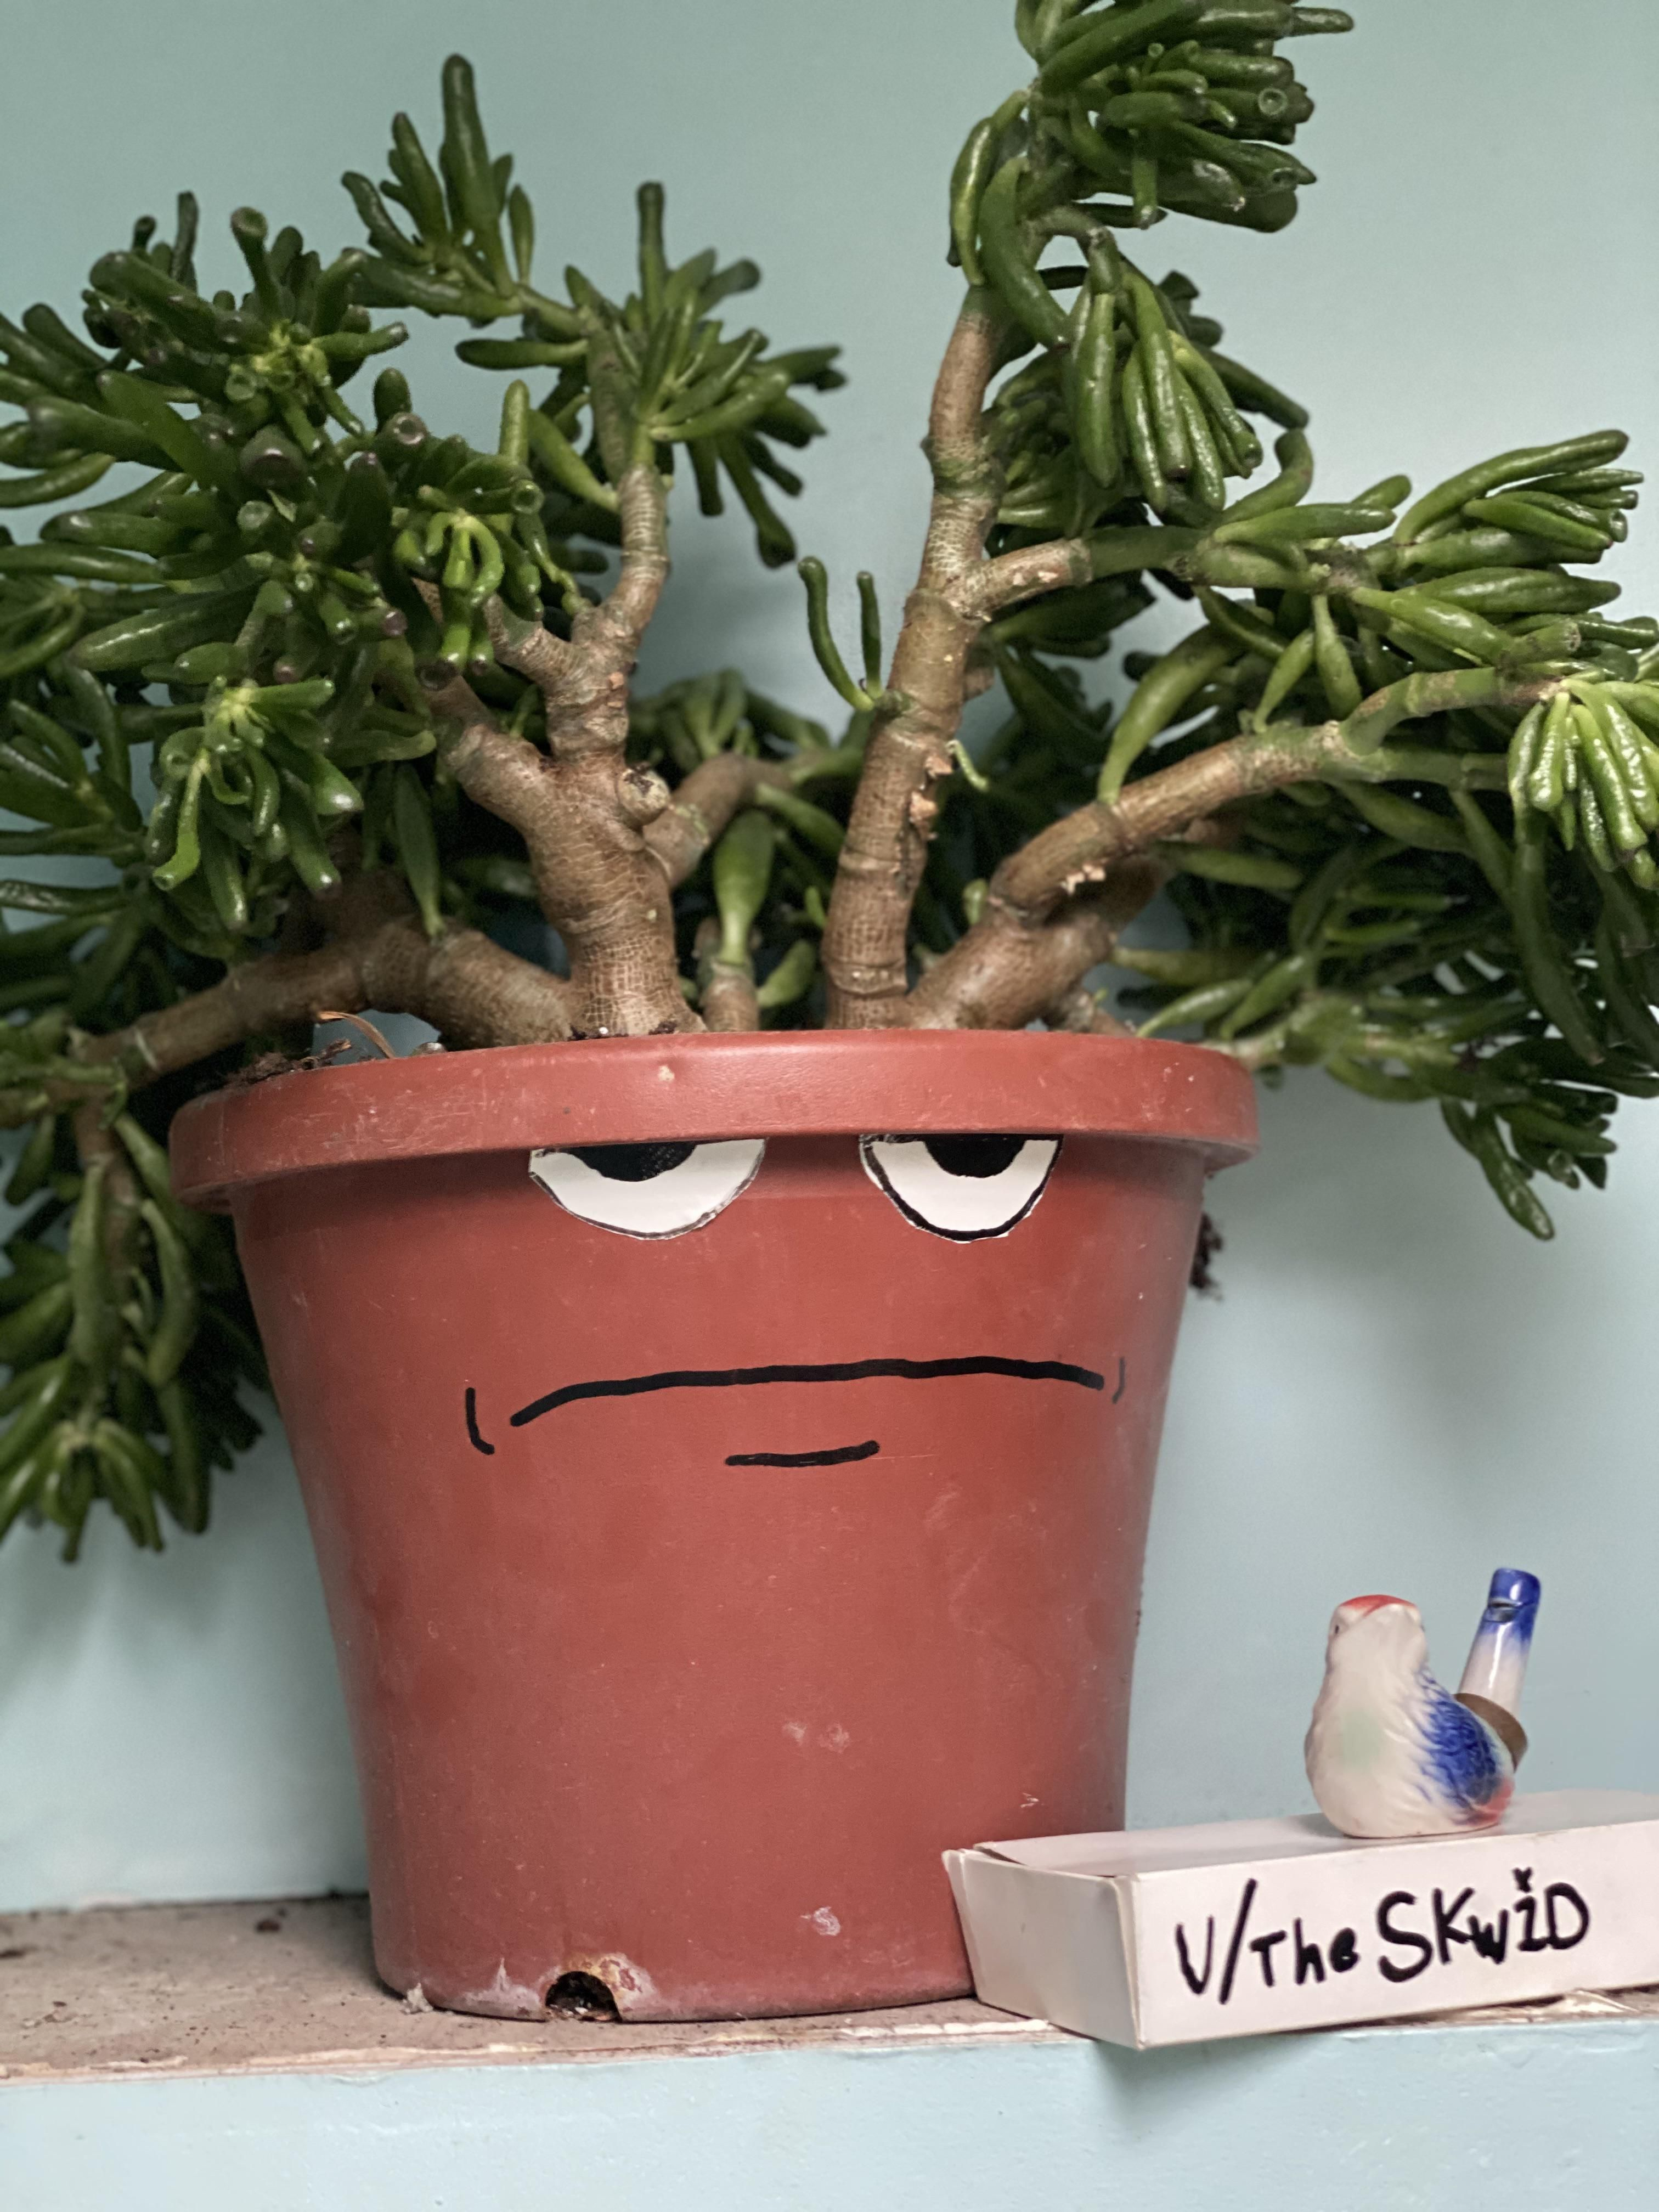 My low effort way to make pots distinguished.